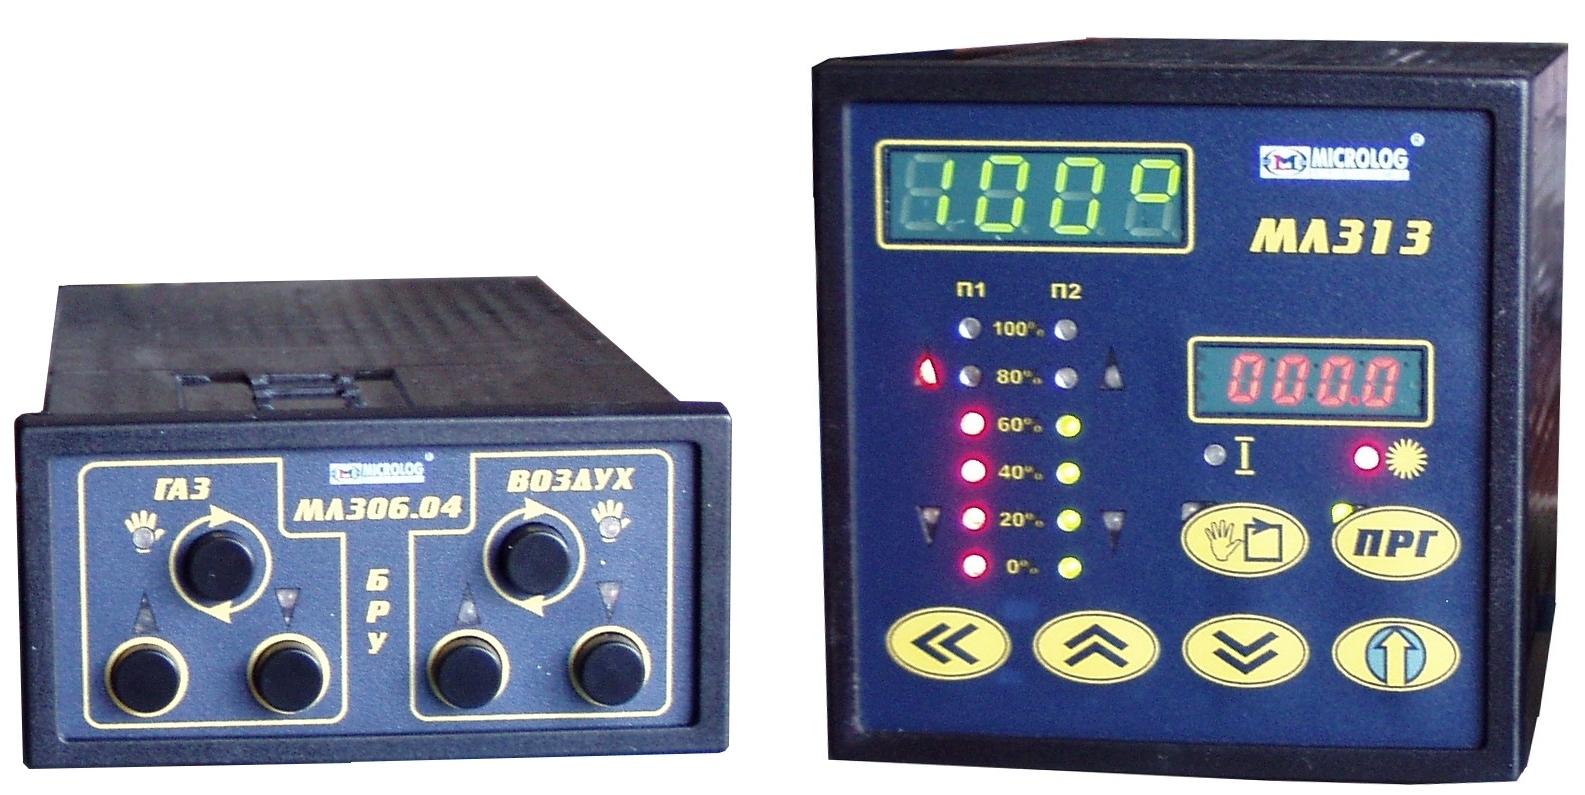 МЛ 313 - Регулятор соотношения параметров